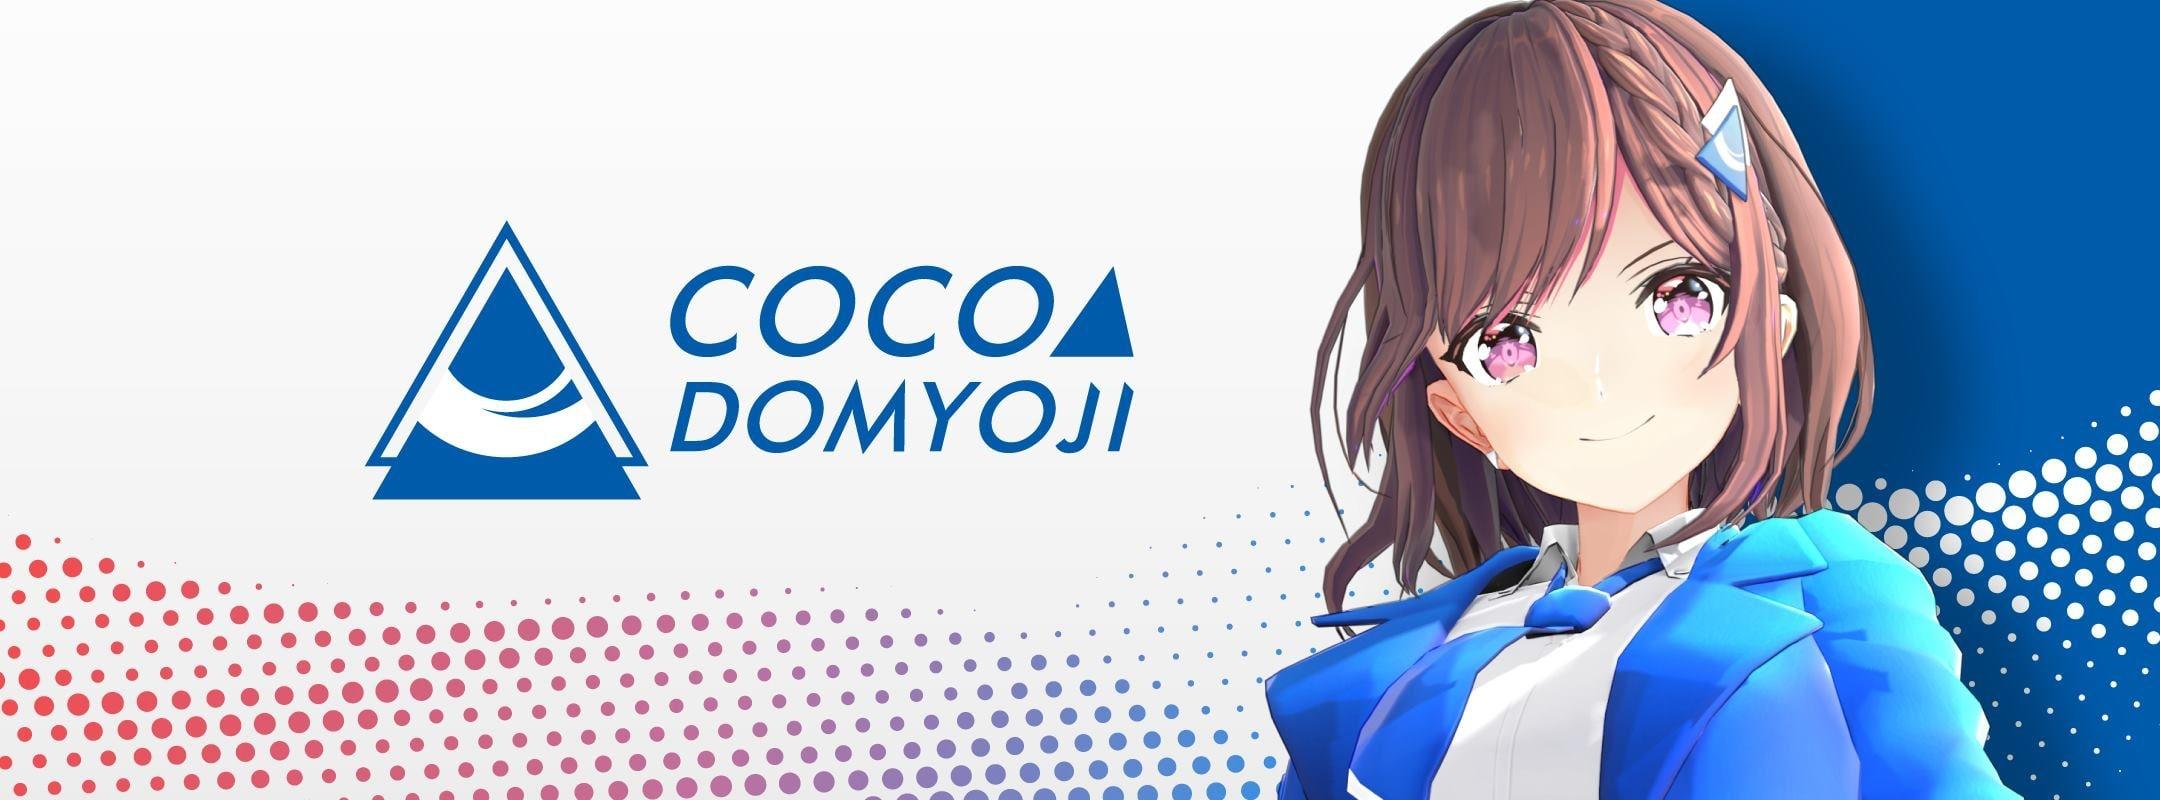 COCOA CHANNEL